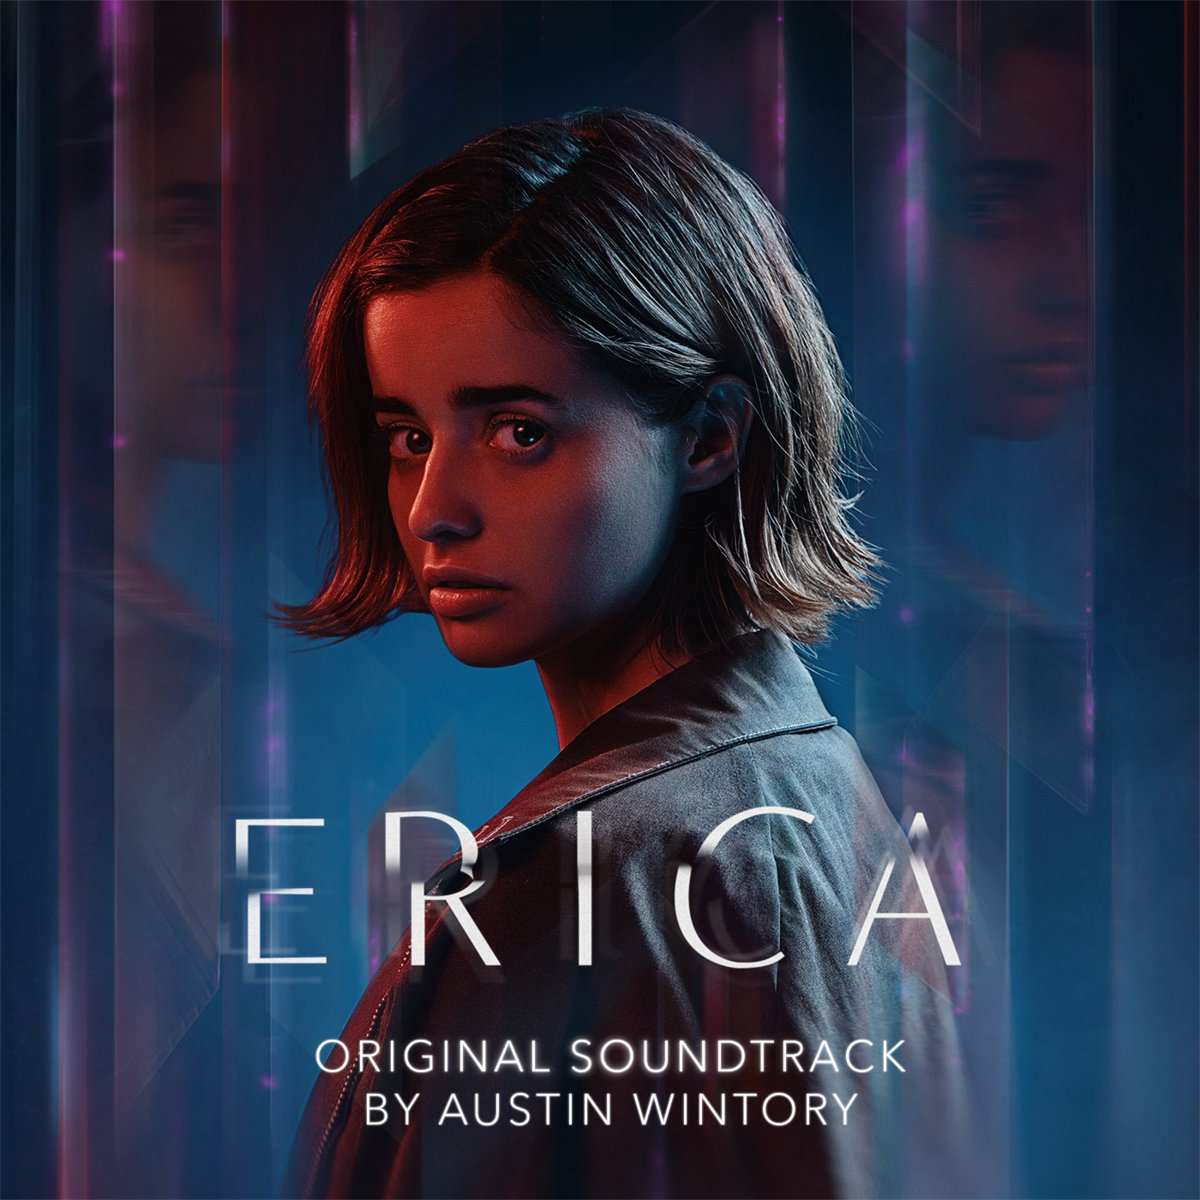 Buy Erica (Video Game Soundtrack) [ mp3] | (Digital Soundtracks)